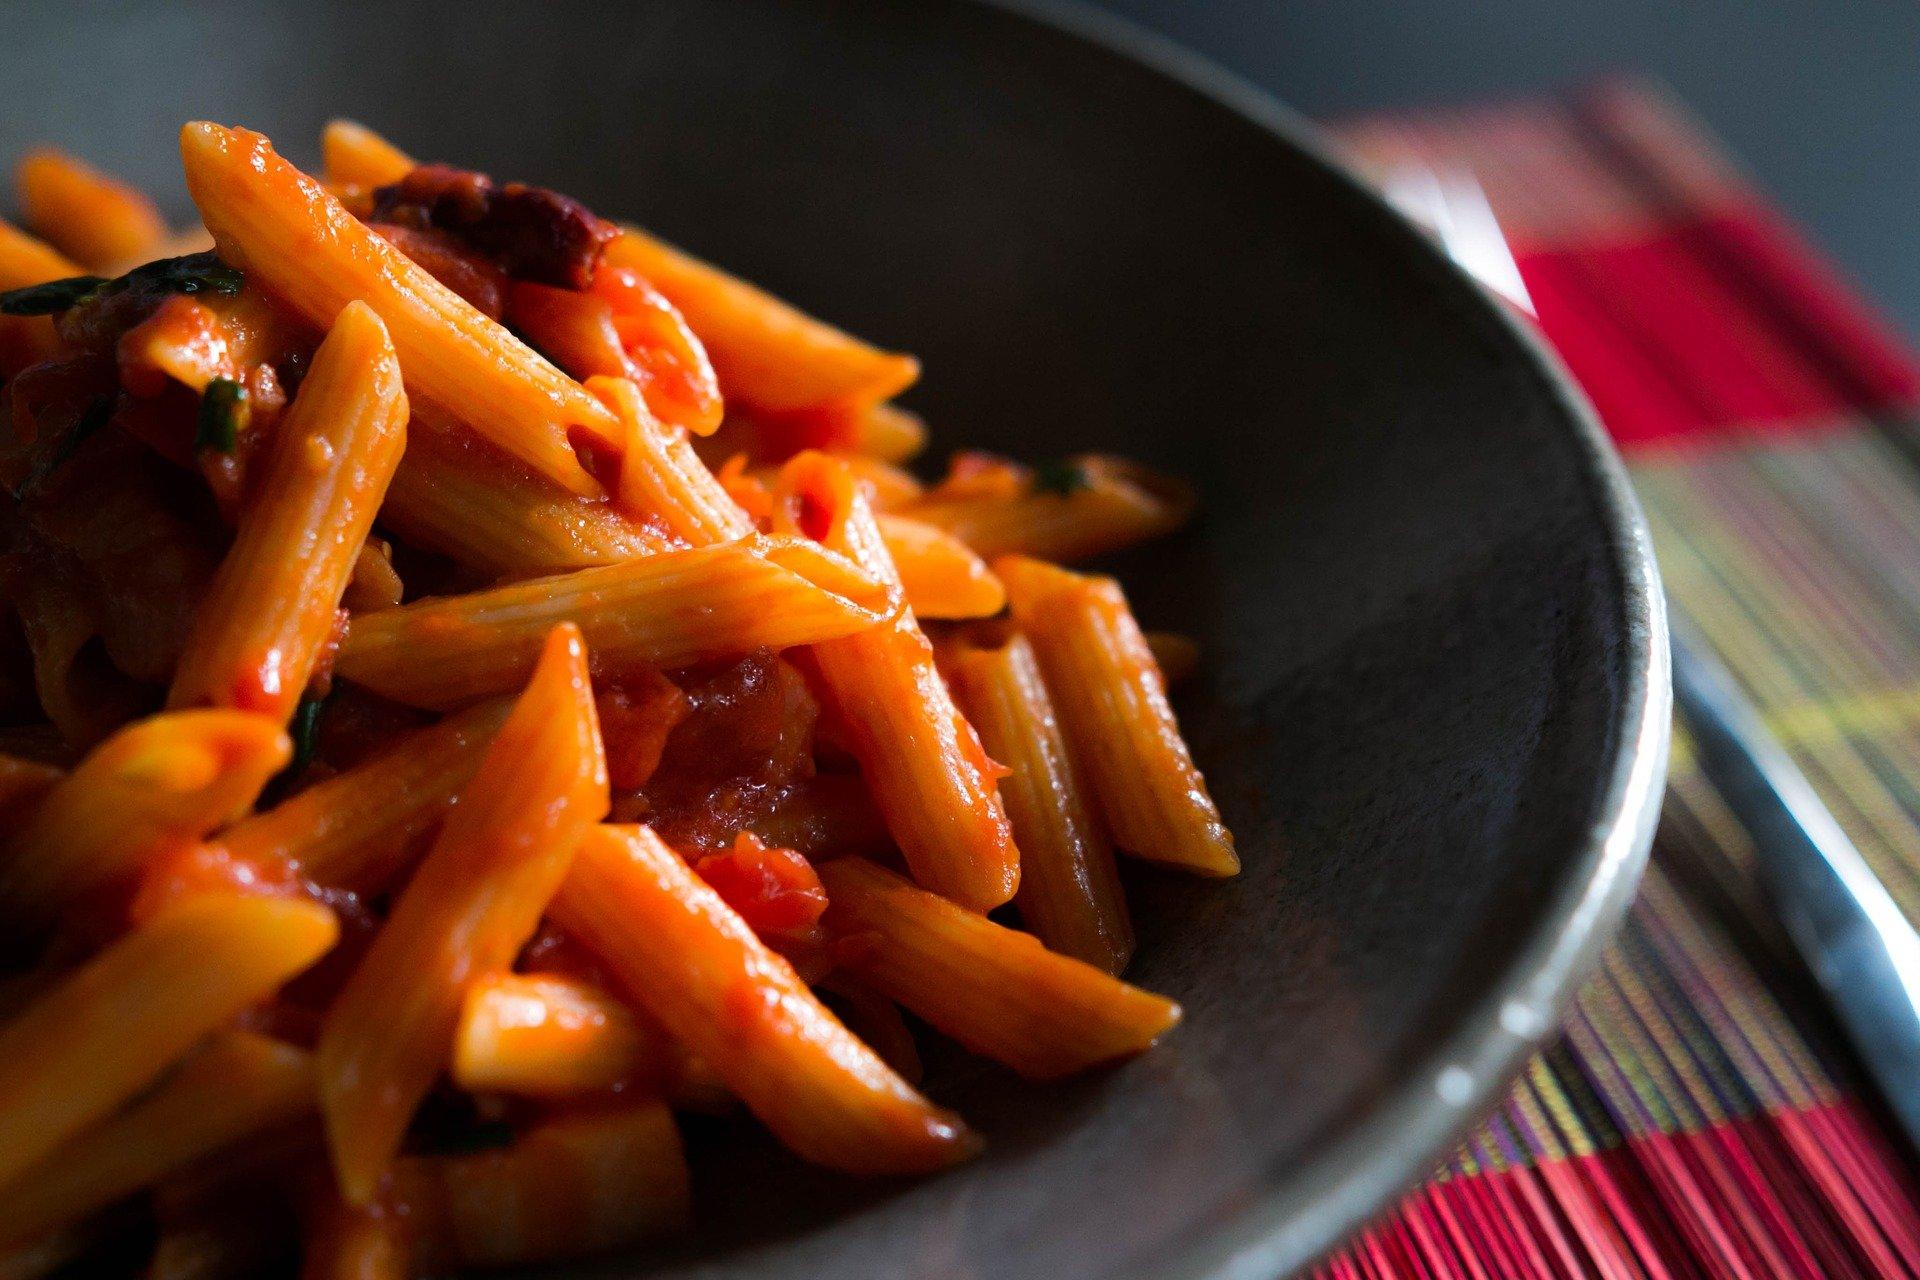 pasta 2142229 1920.jpg?resize=1200,630 - 木村文乃のインスタグラムのご飯が美味しそうすぎて、旦那さんが羨ましい。